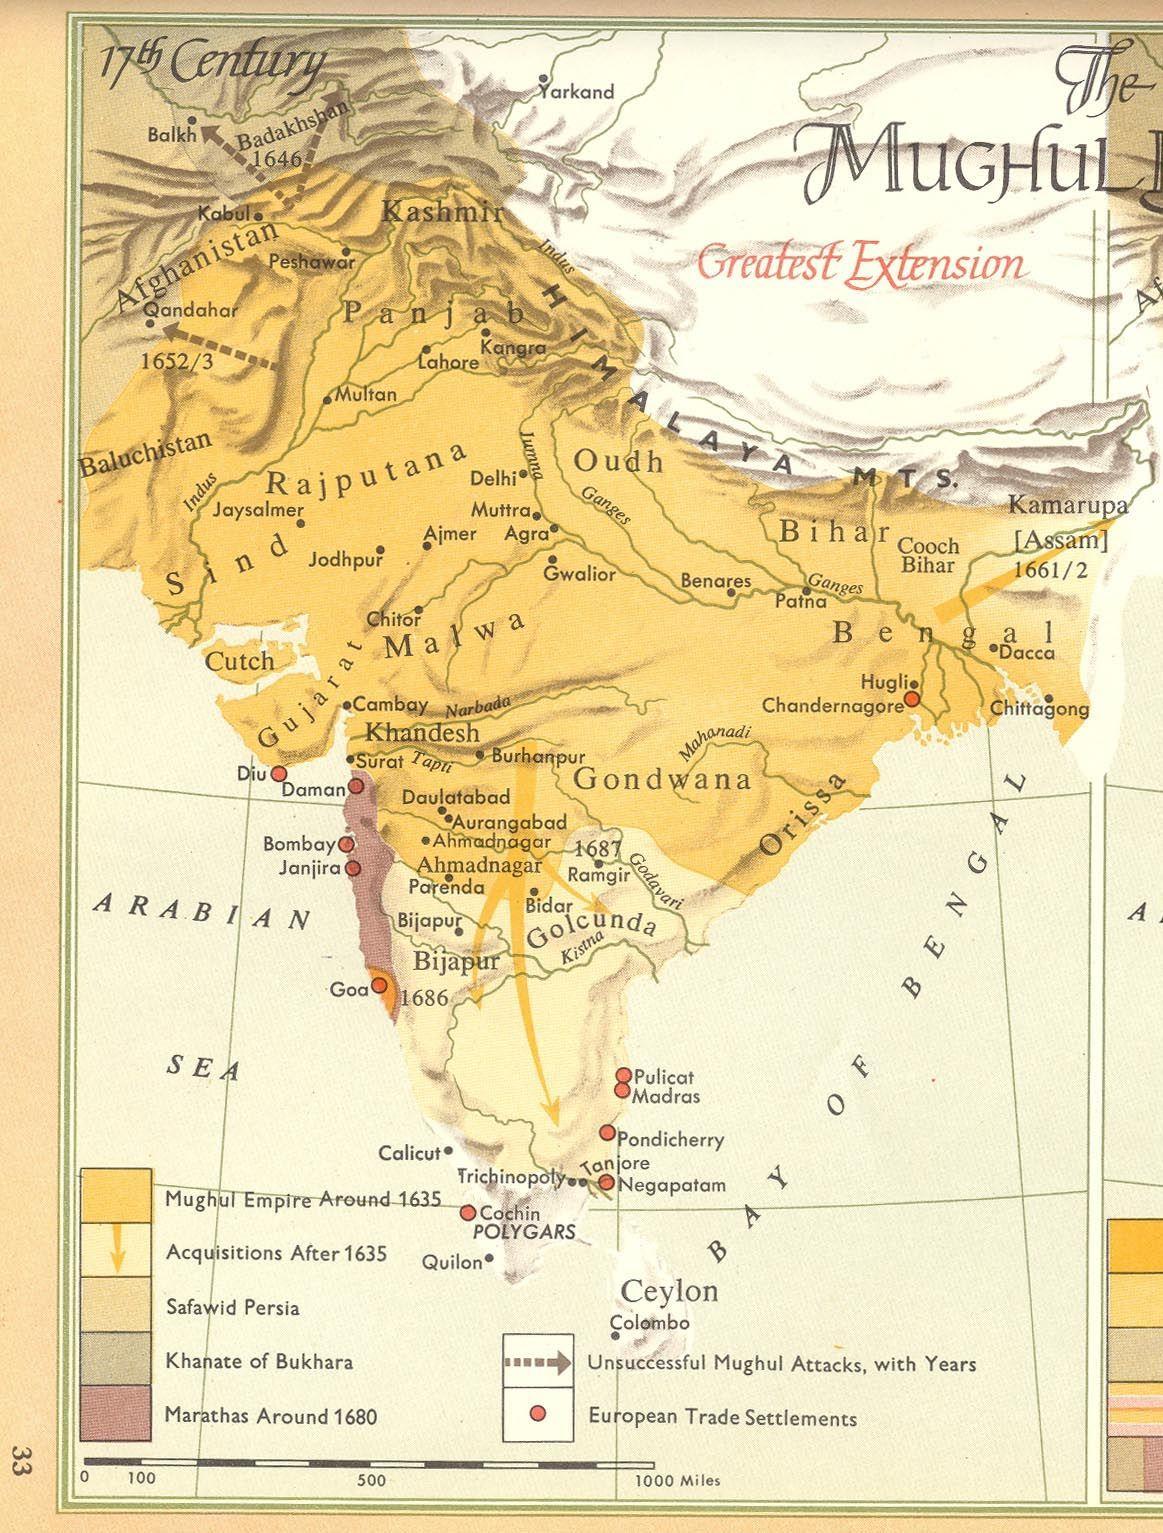 14 1600s mughal empire httpsglobalitannicatopic 1600s mughal empire httpsglobalitannicatopicmughal dynasty httpbbcreligionreligionsislamhistorymughalempire1tml gumiabroncs Image collections